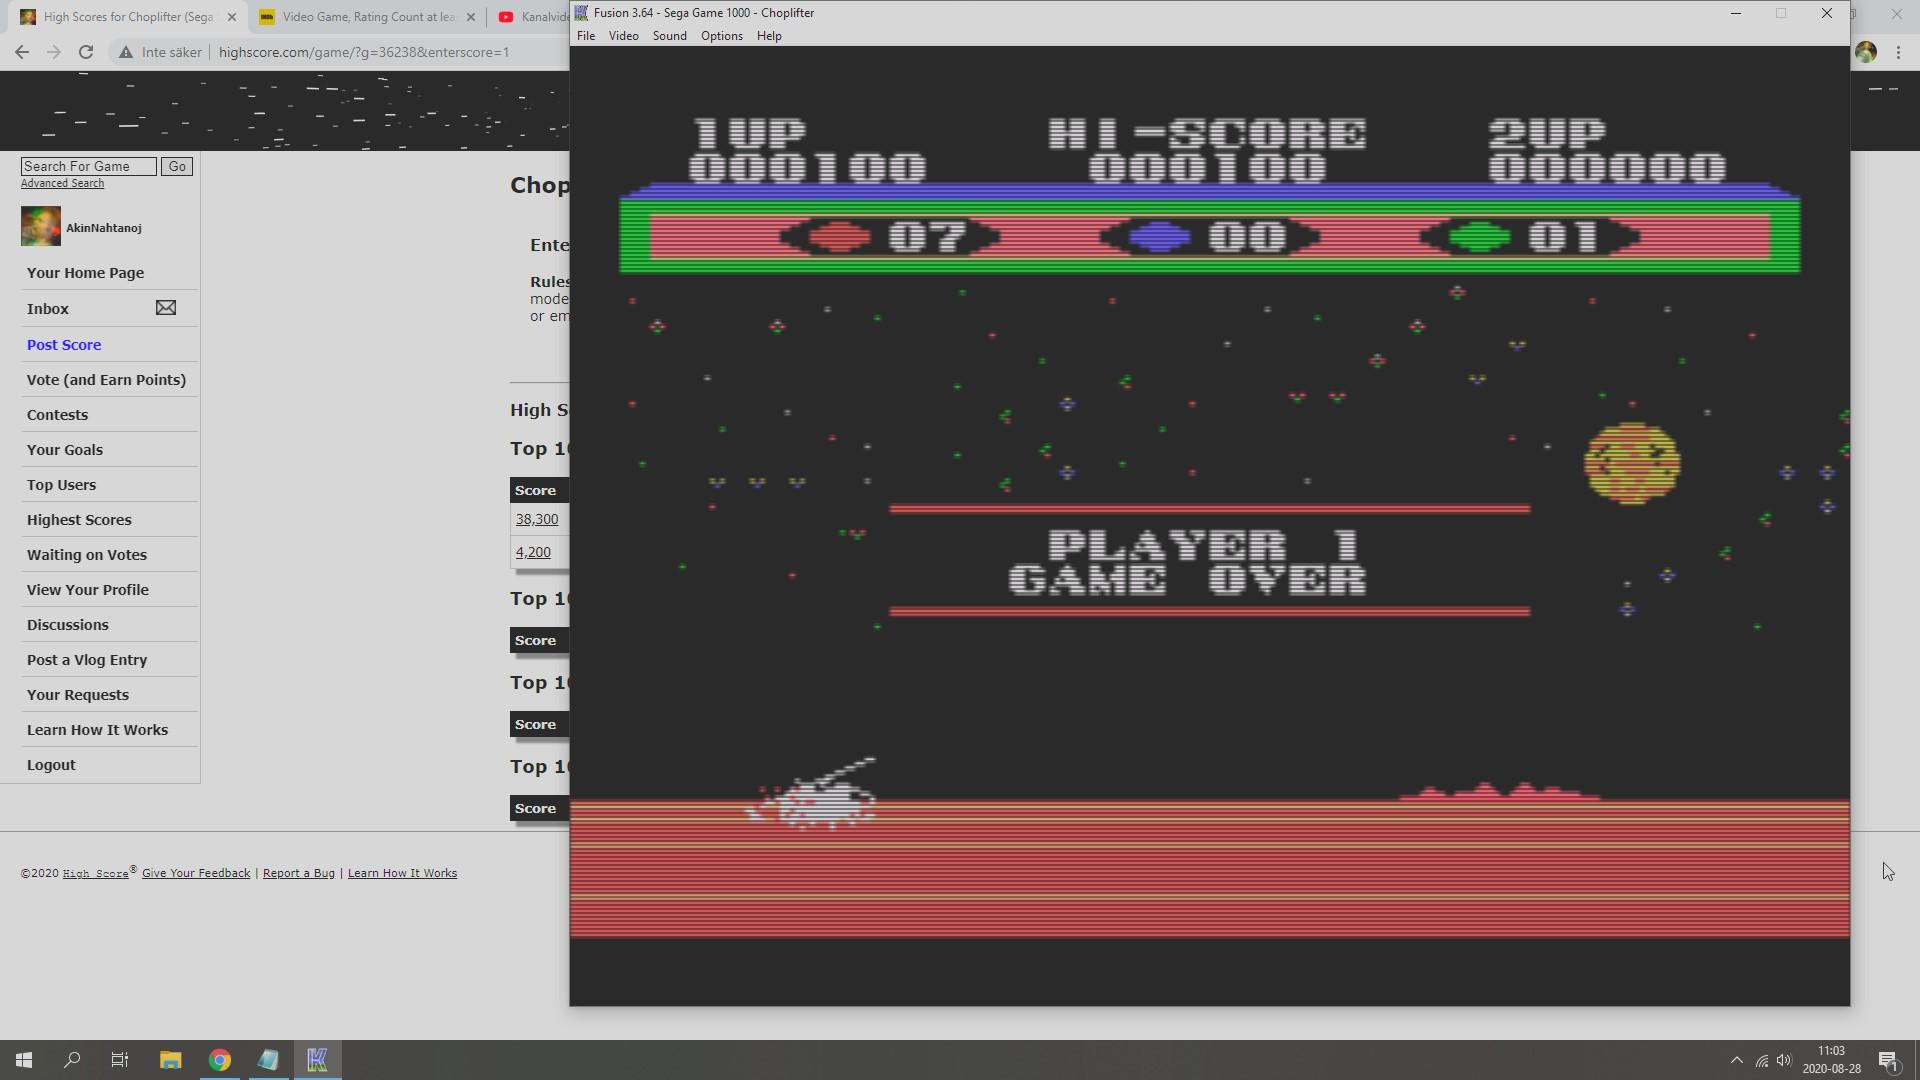 AkinNahtanoj: Choplifter (Sega SG-1000 Emulated) 100 points on 2020-08-28 04:07:02